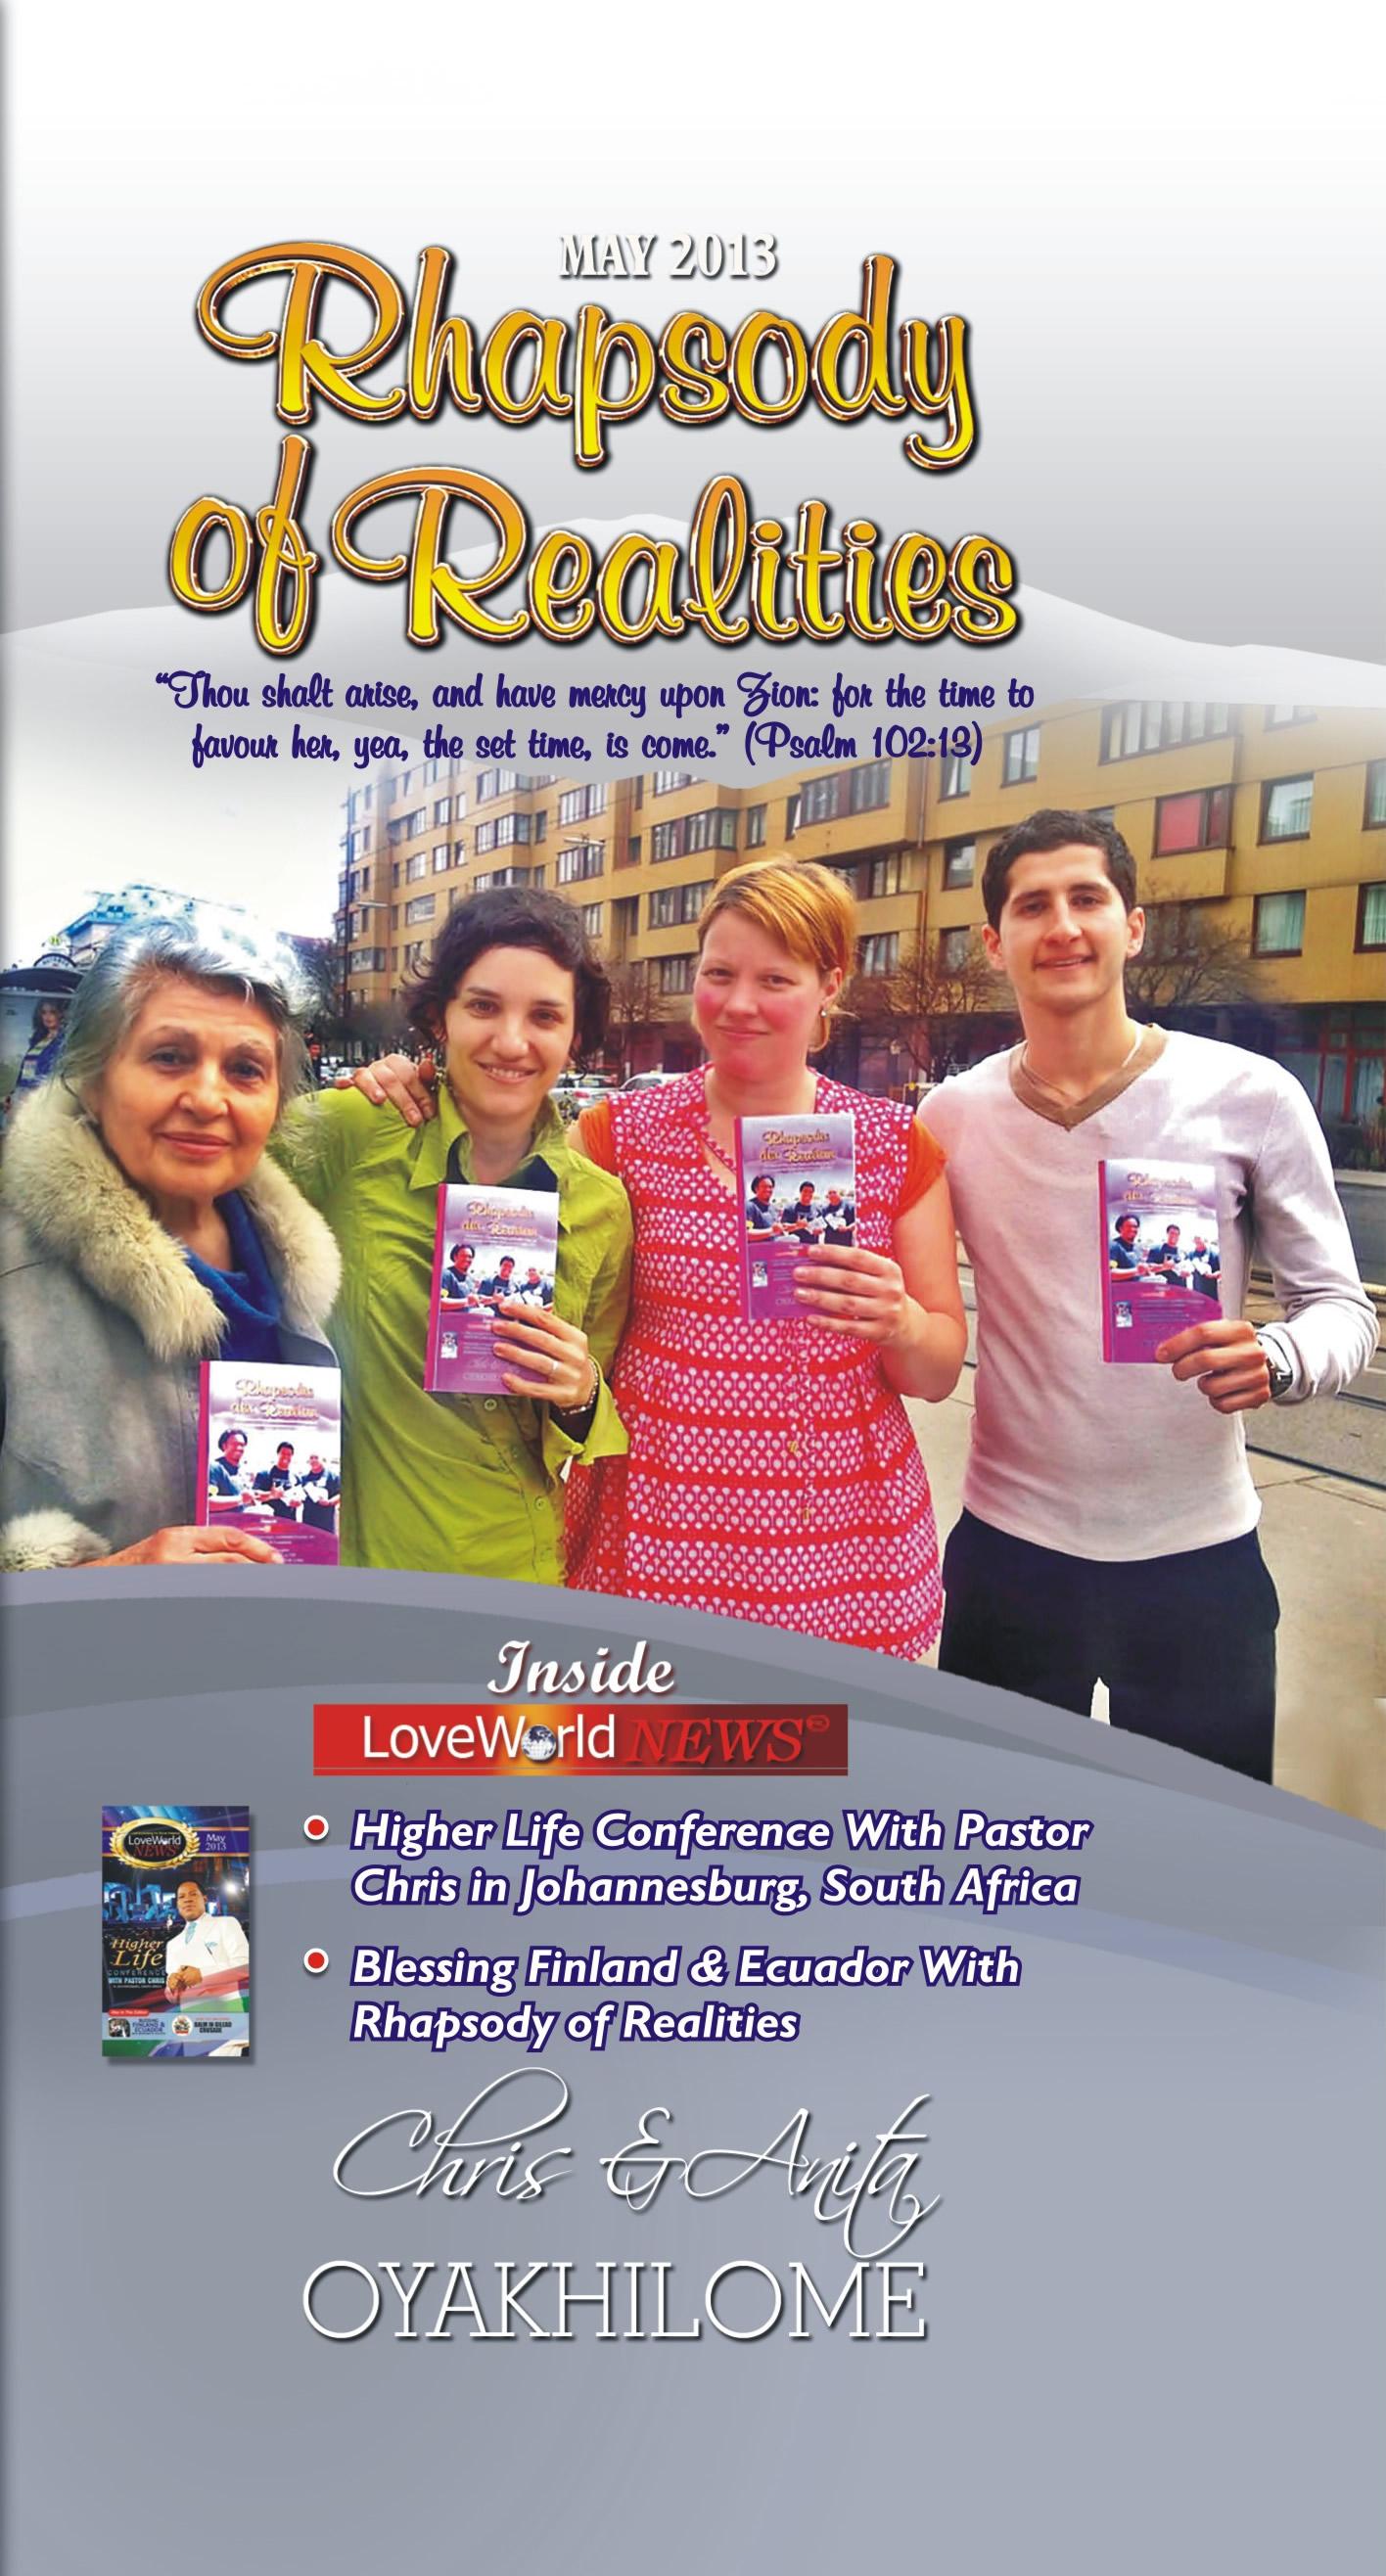 Pastor Chris and Anita Oyakhilome - Rhapsody of Realities May 2013 Edition